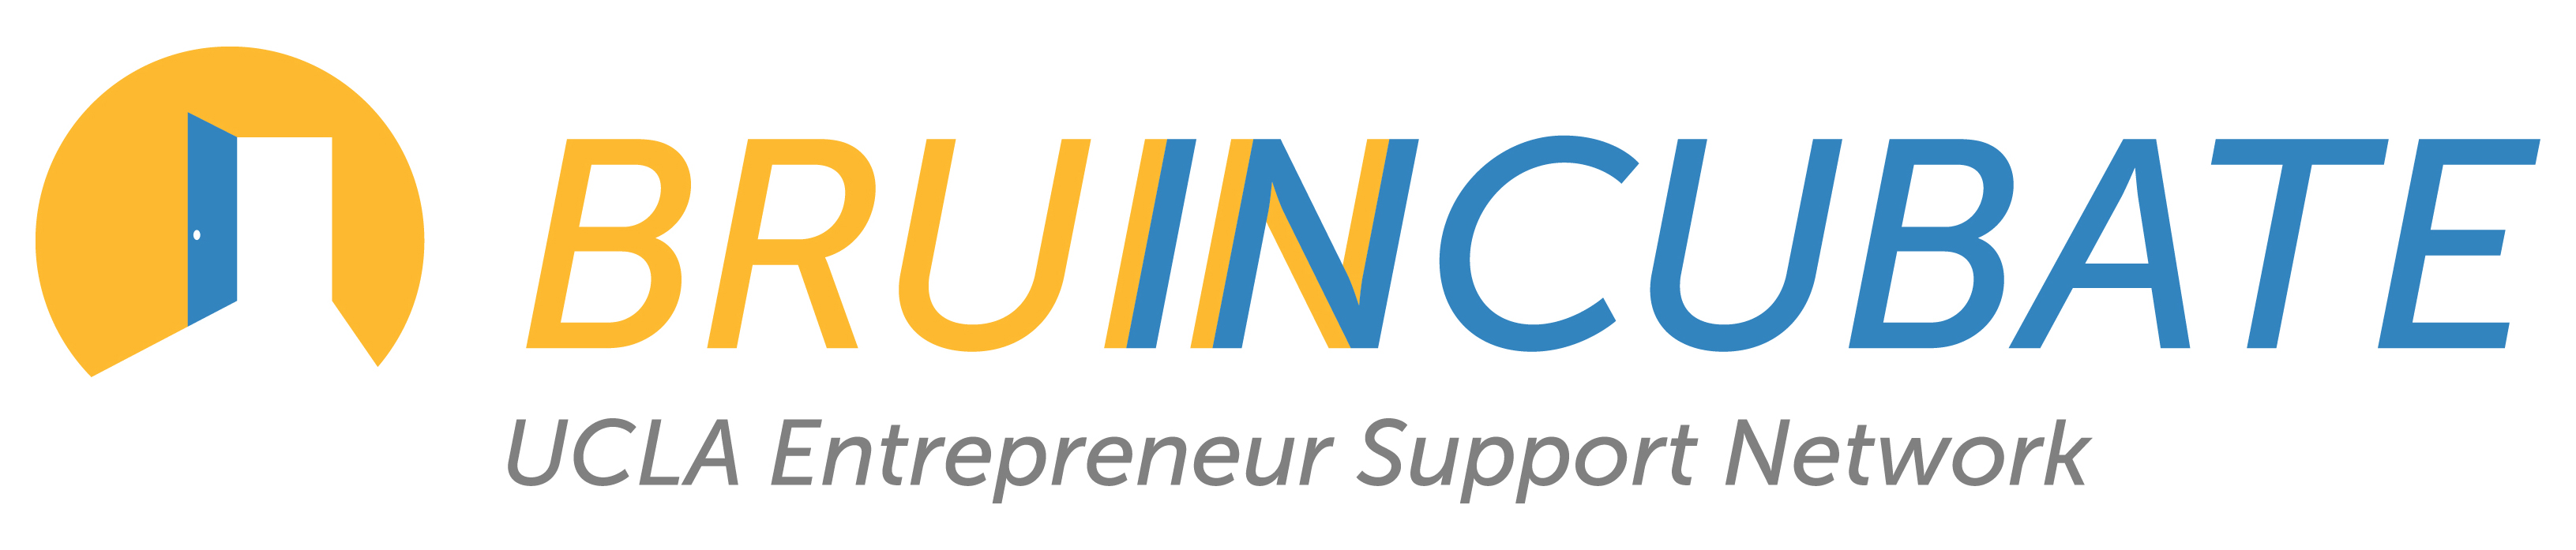 UCLA_bruincubate-logo-final_copy.jpg